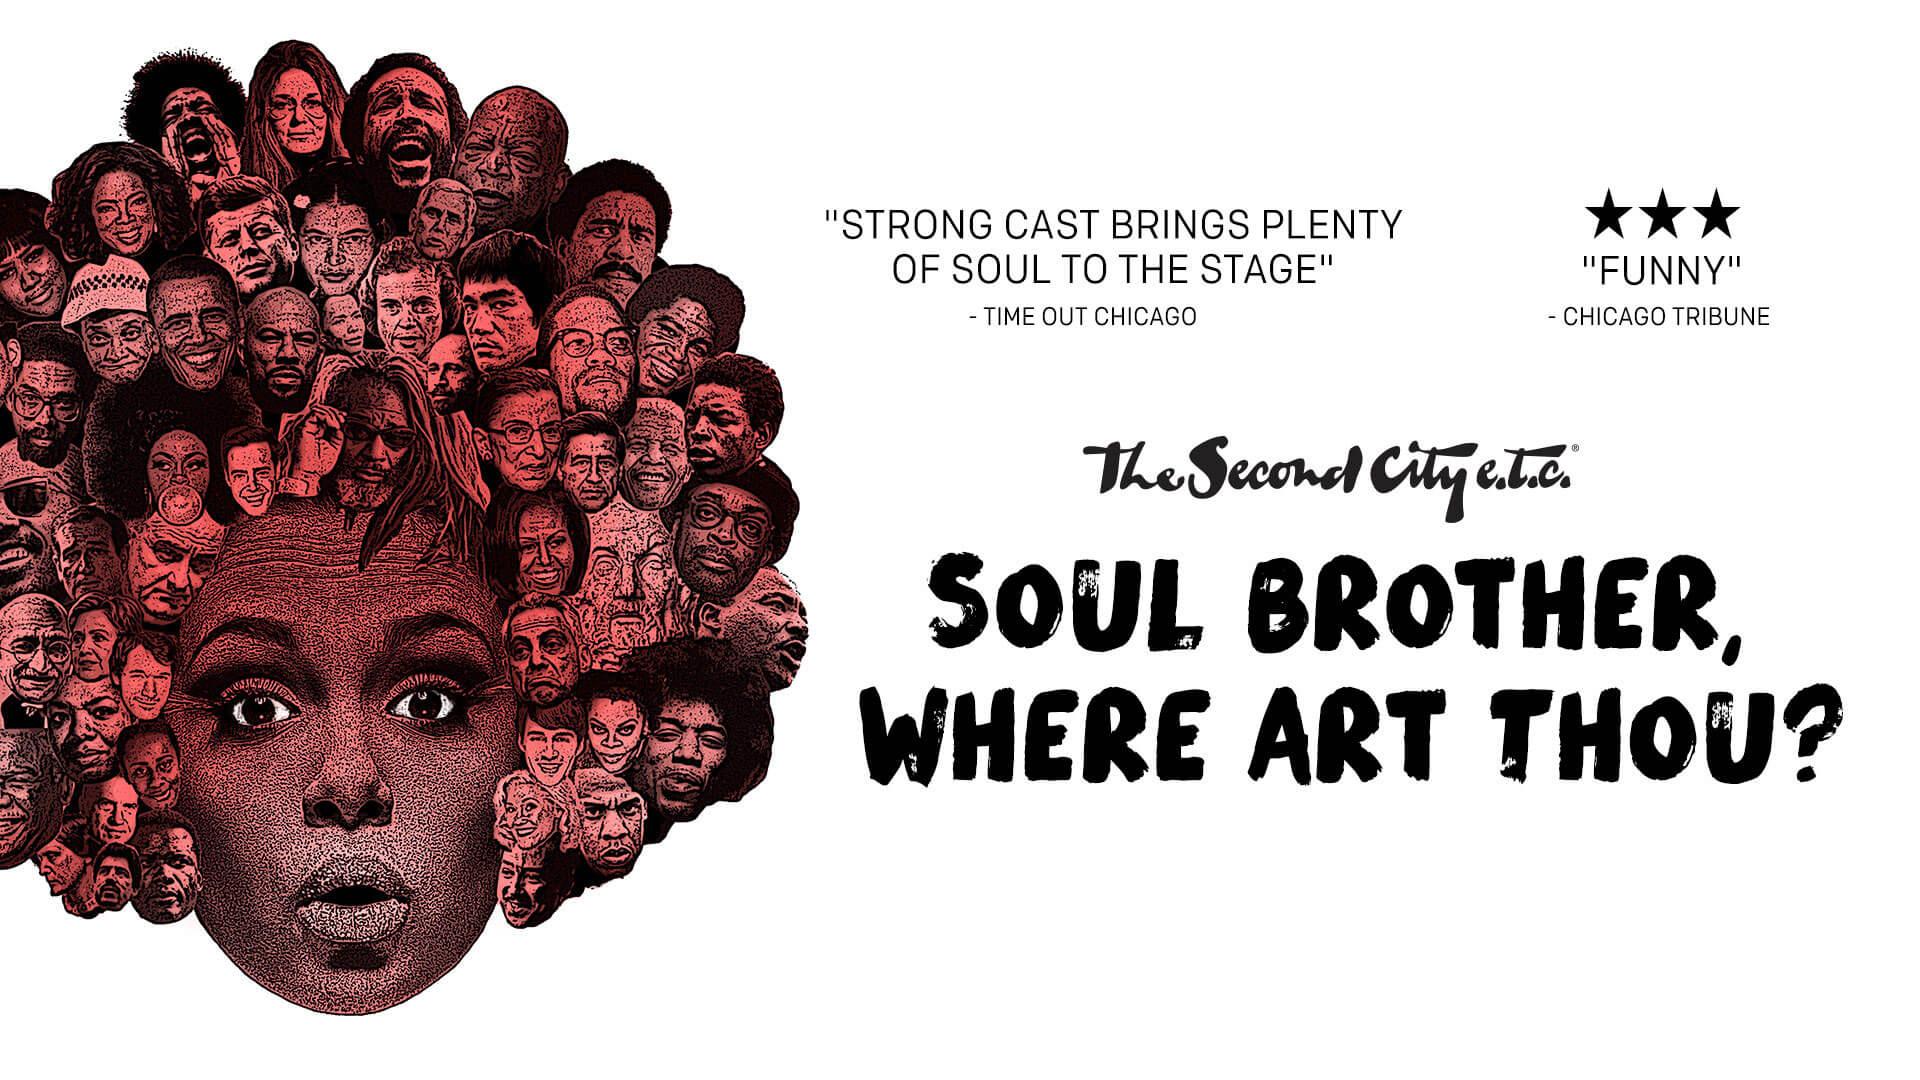 The Second City e.t.c. s 39th Revue-Soul Brother 0f5761f3a